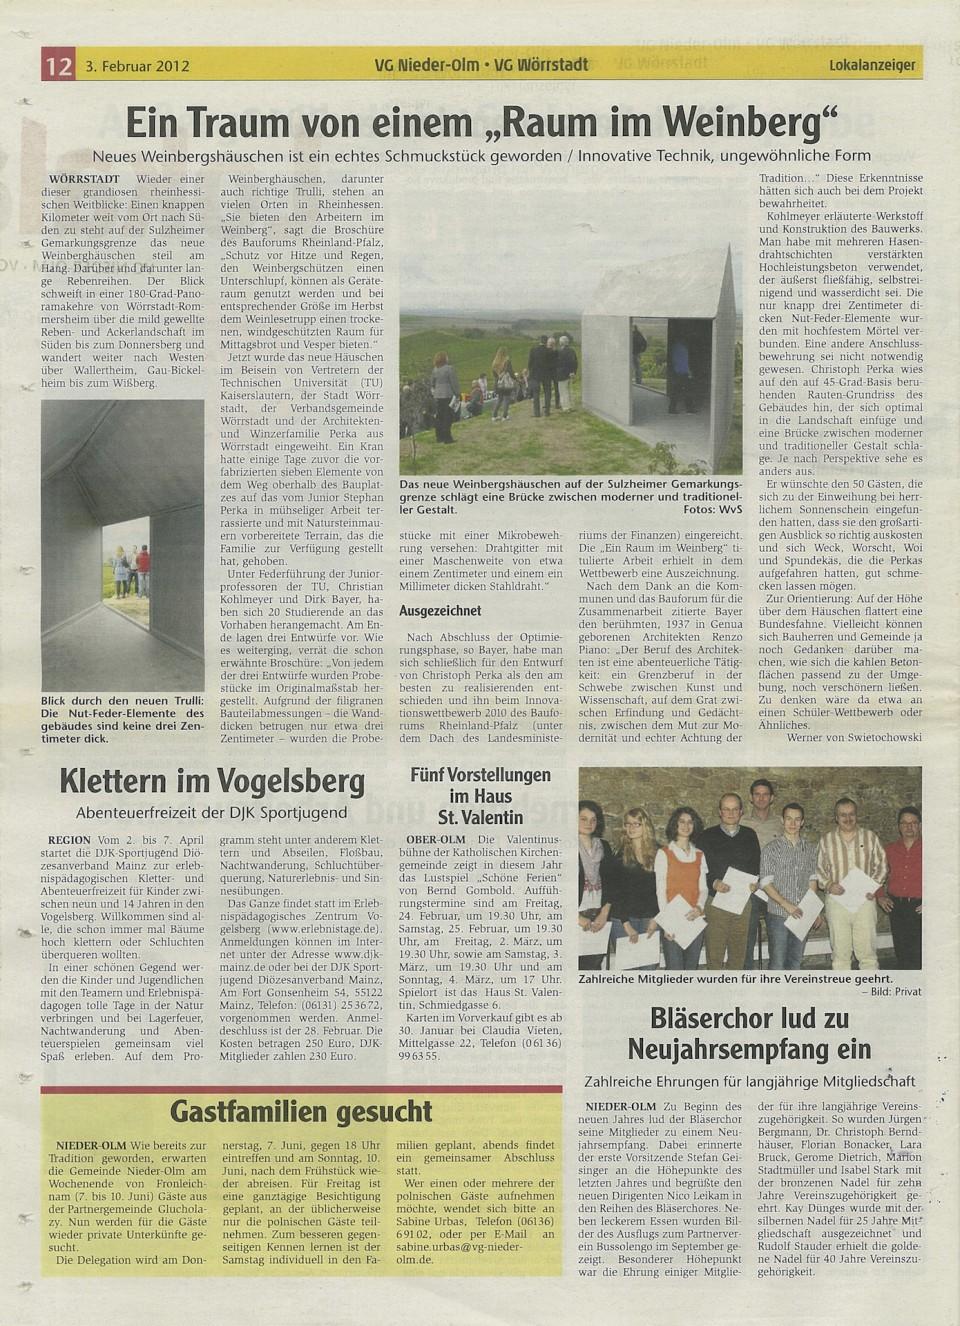 Das Weinberghaus im Lokalanzeiger